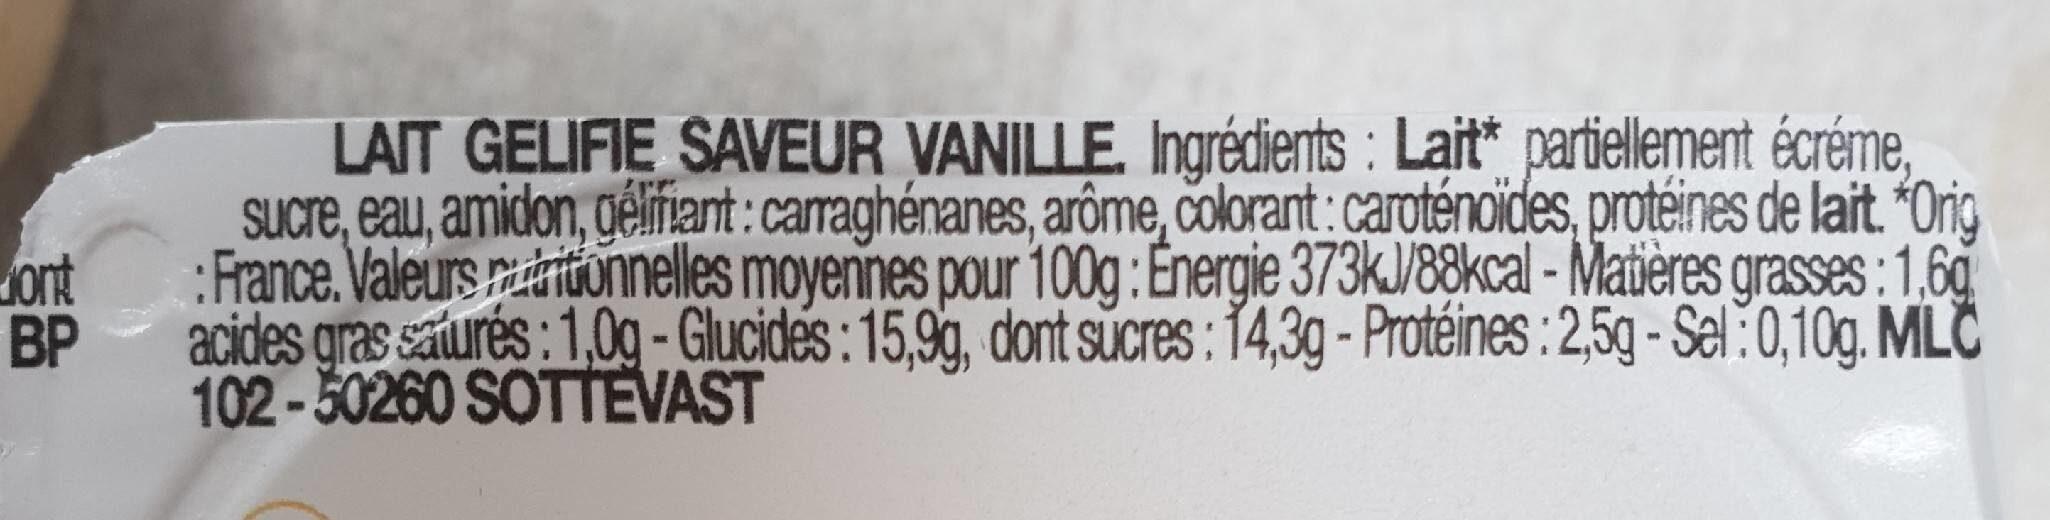 Flan, saveur vanille - Informations nutritionnelles - fr